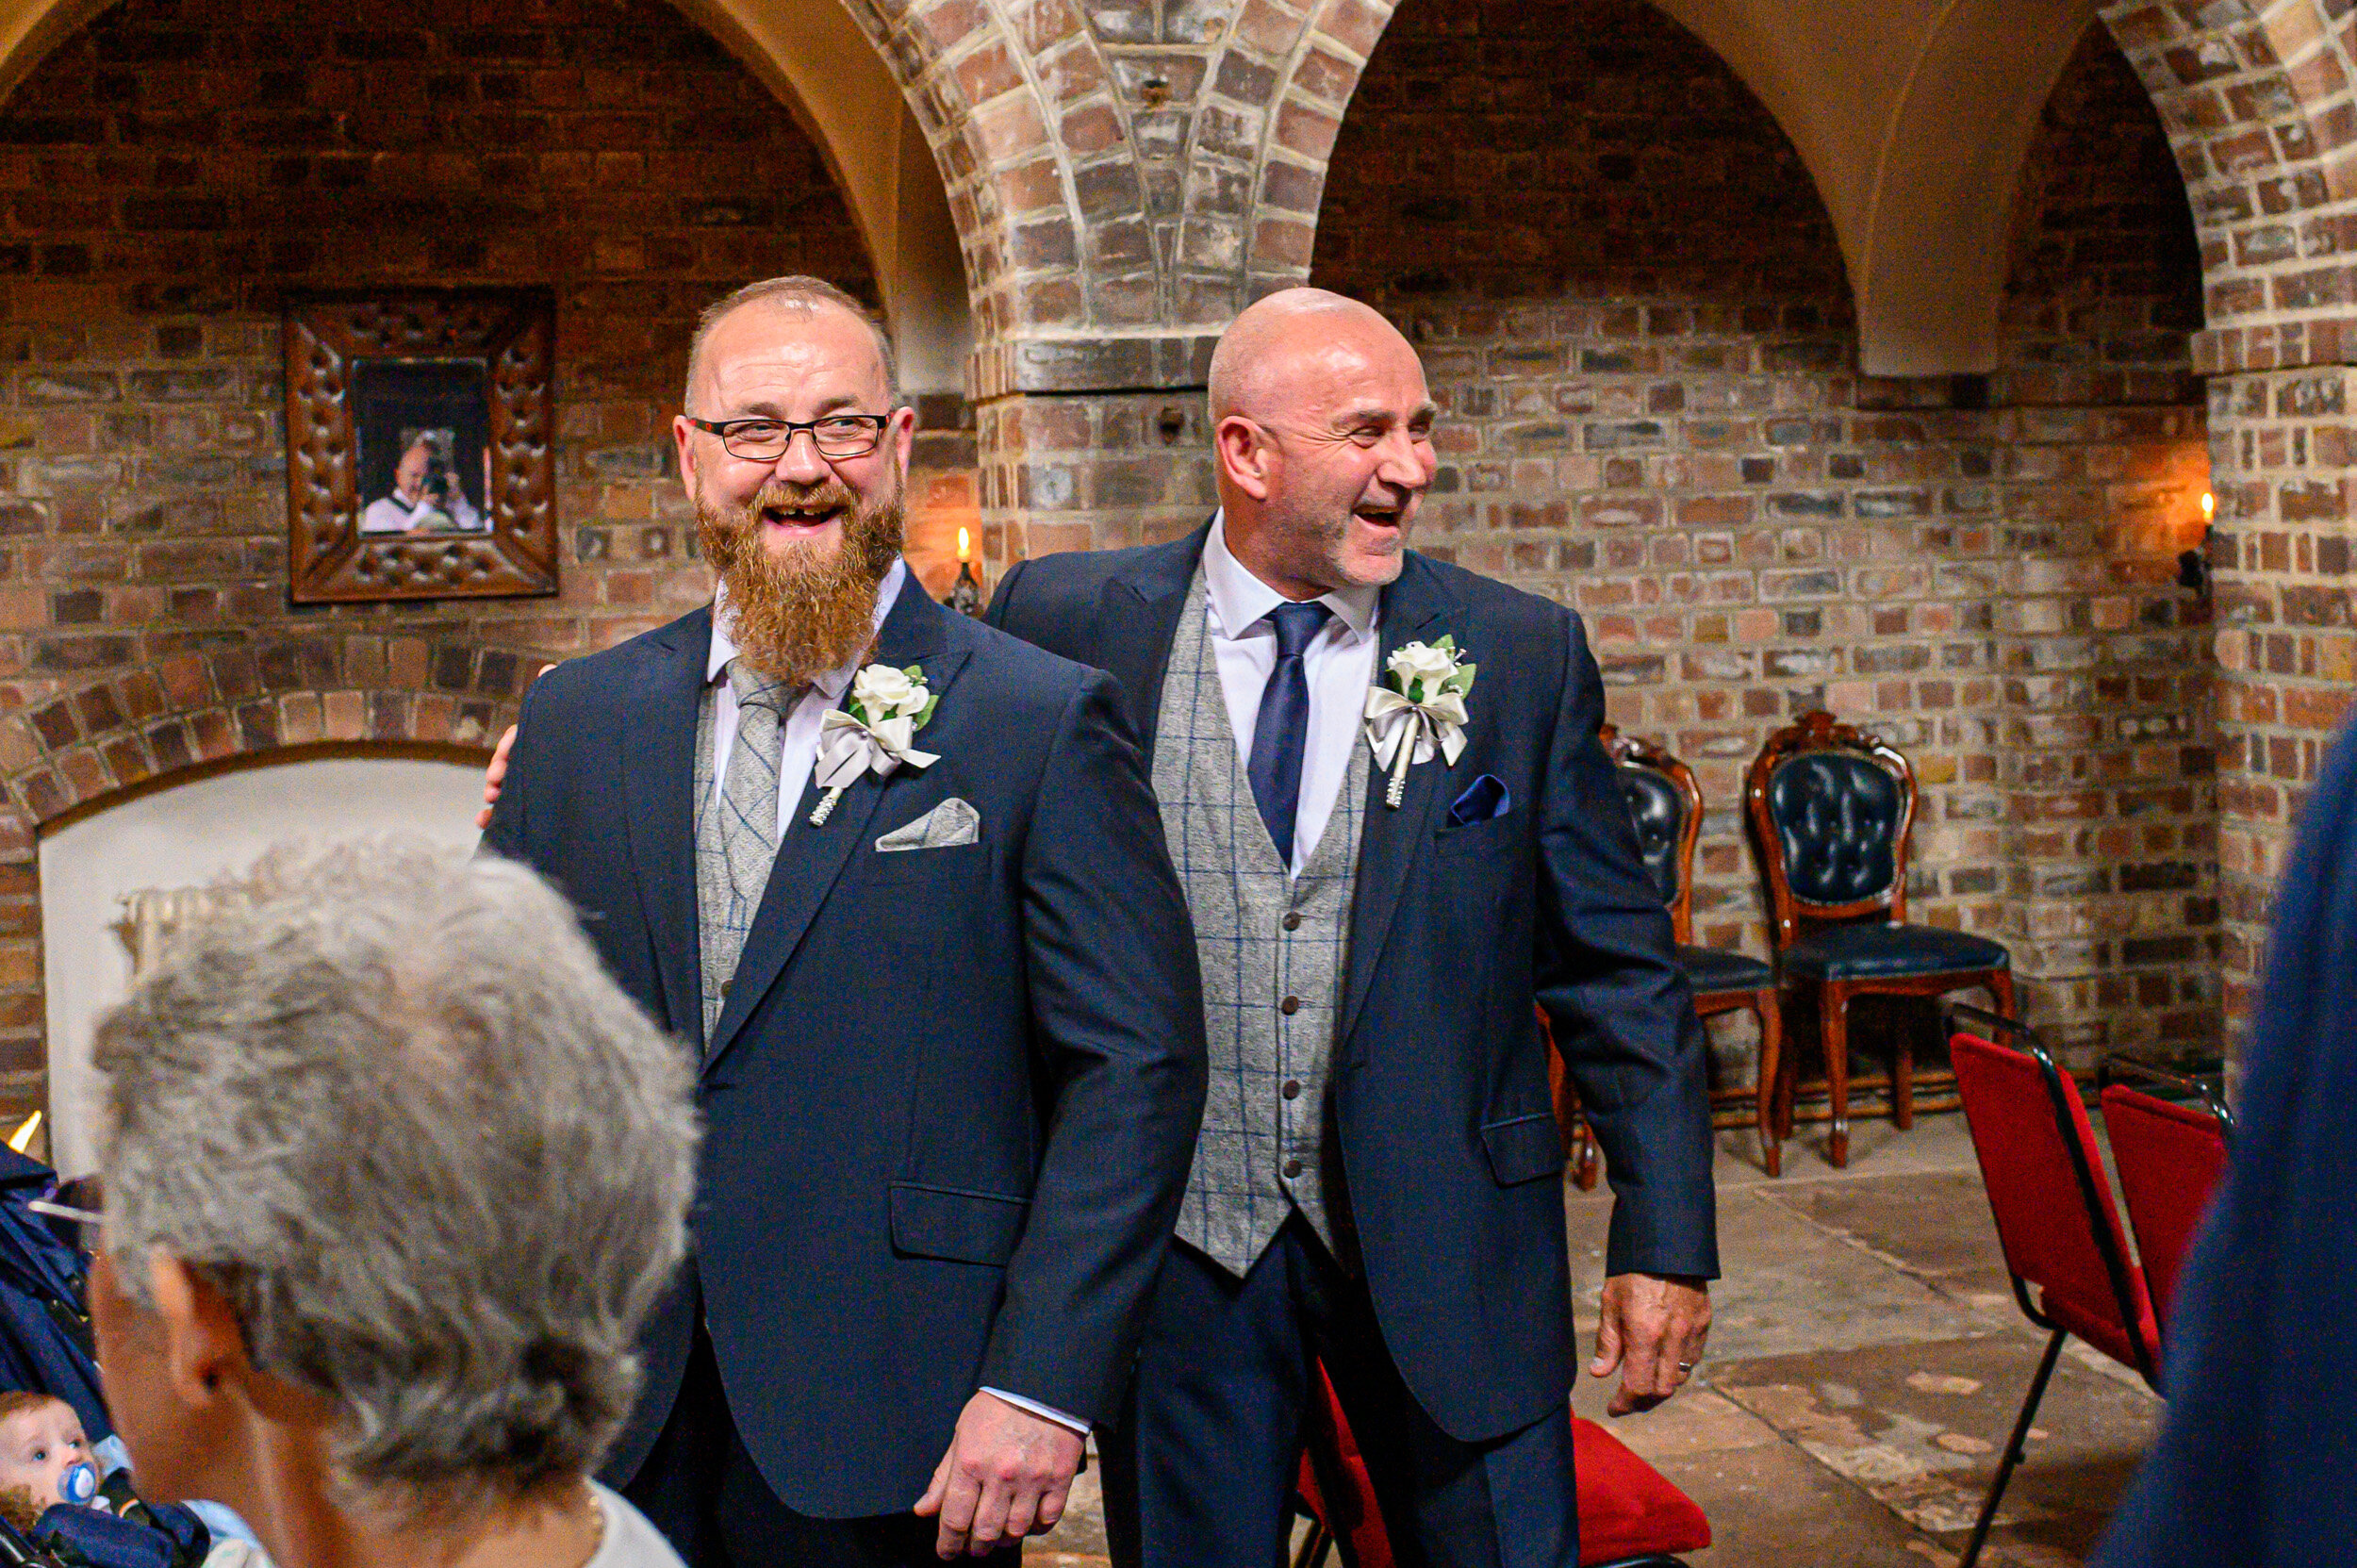 Heaton_wedding_photos_Gretna-9.jpg